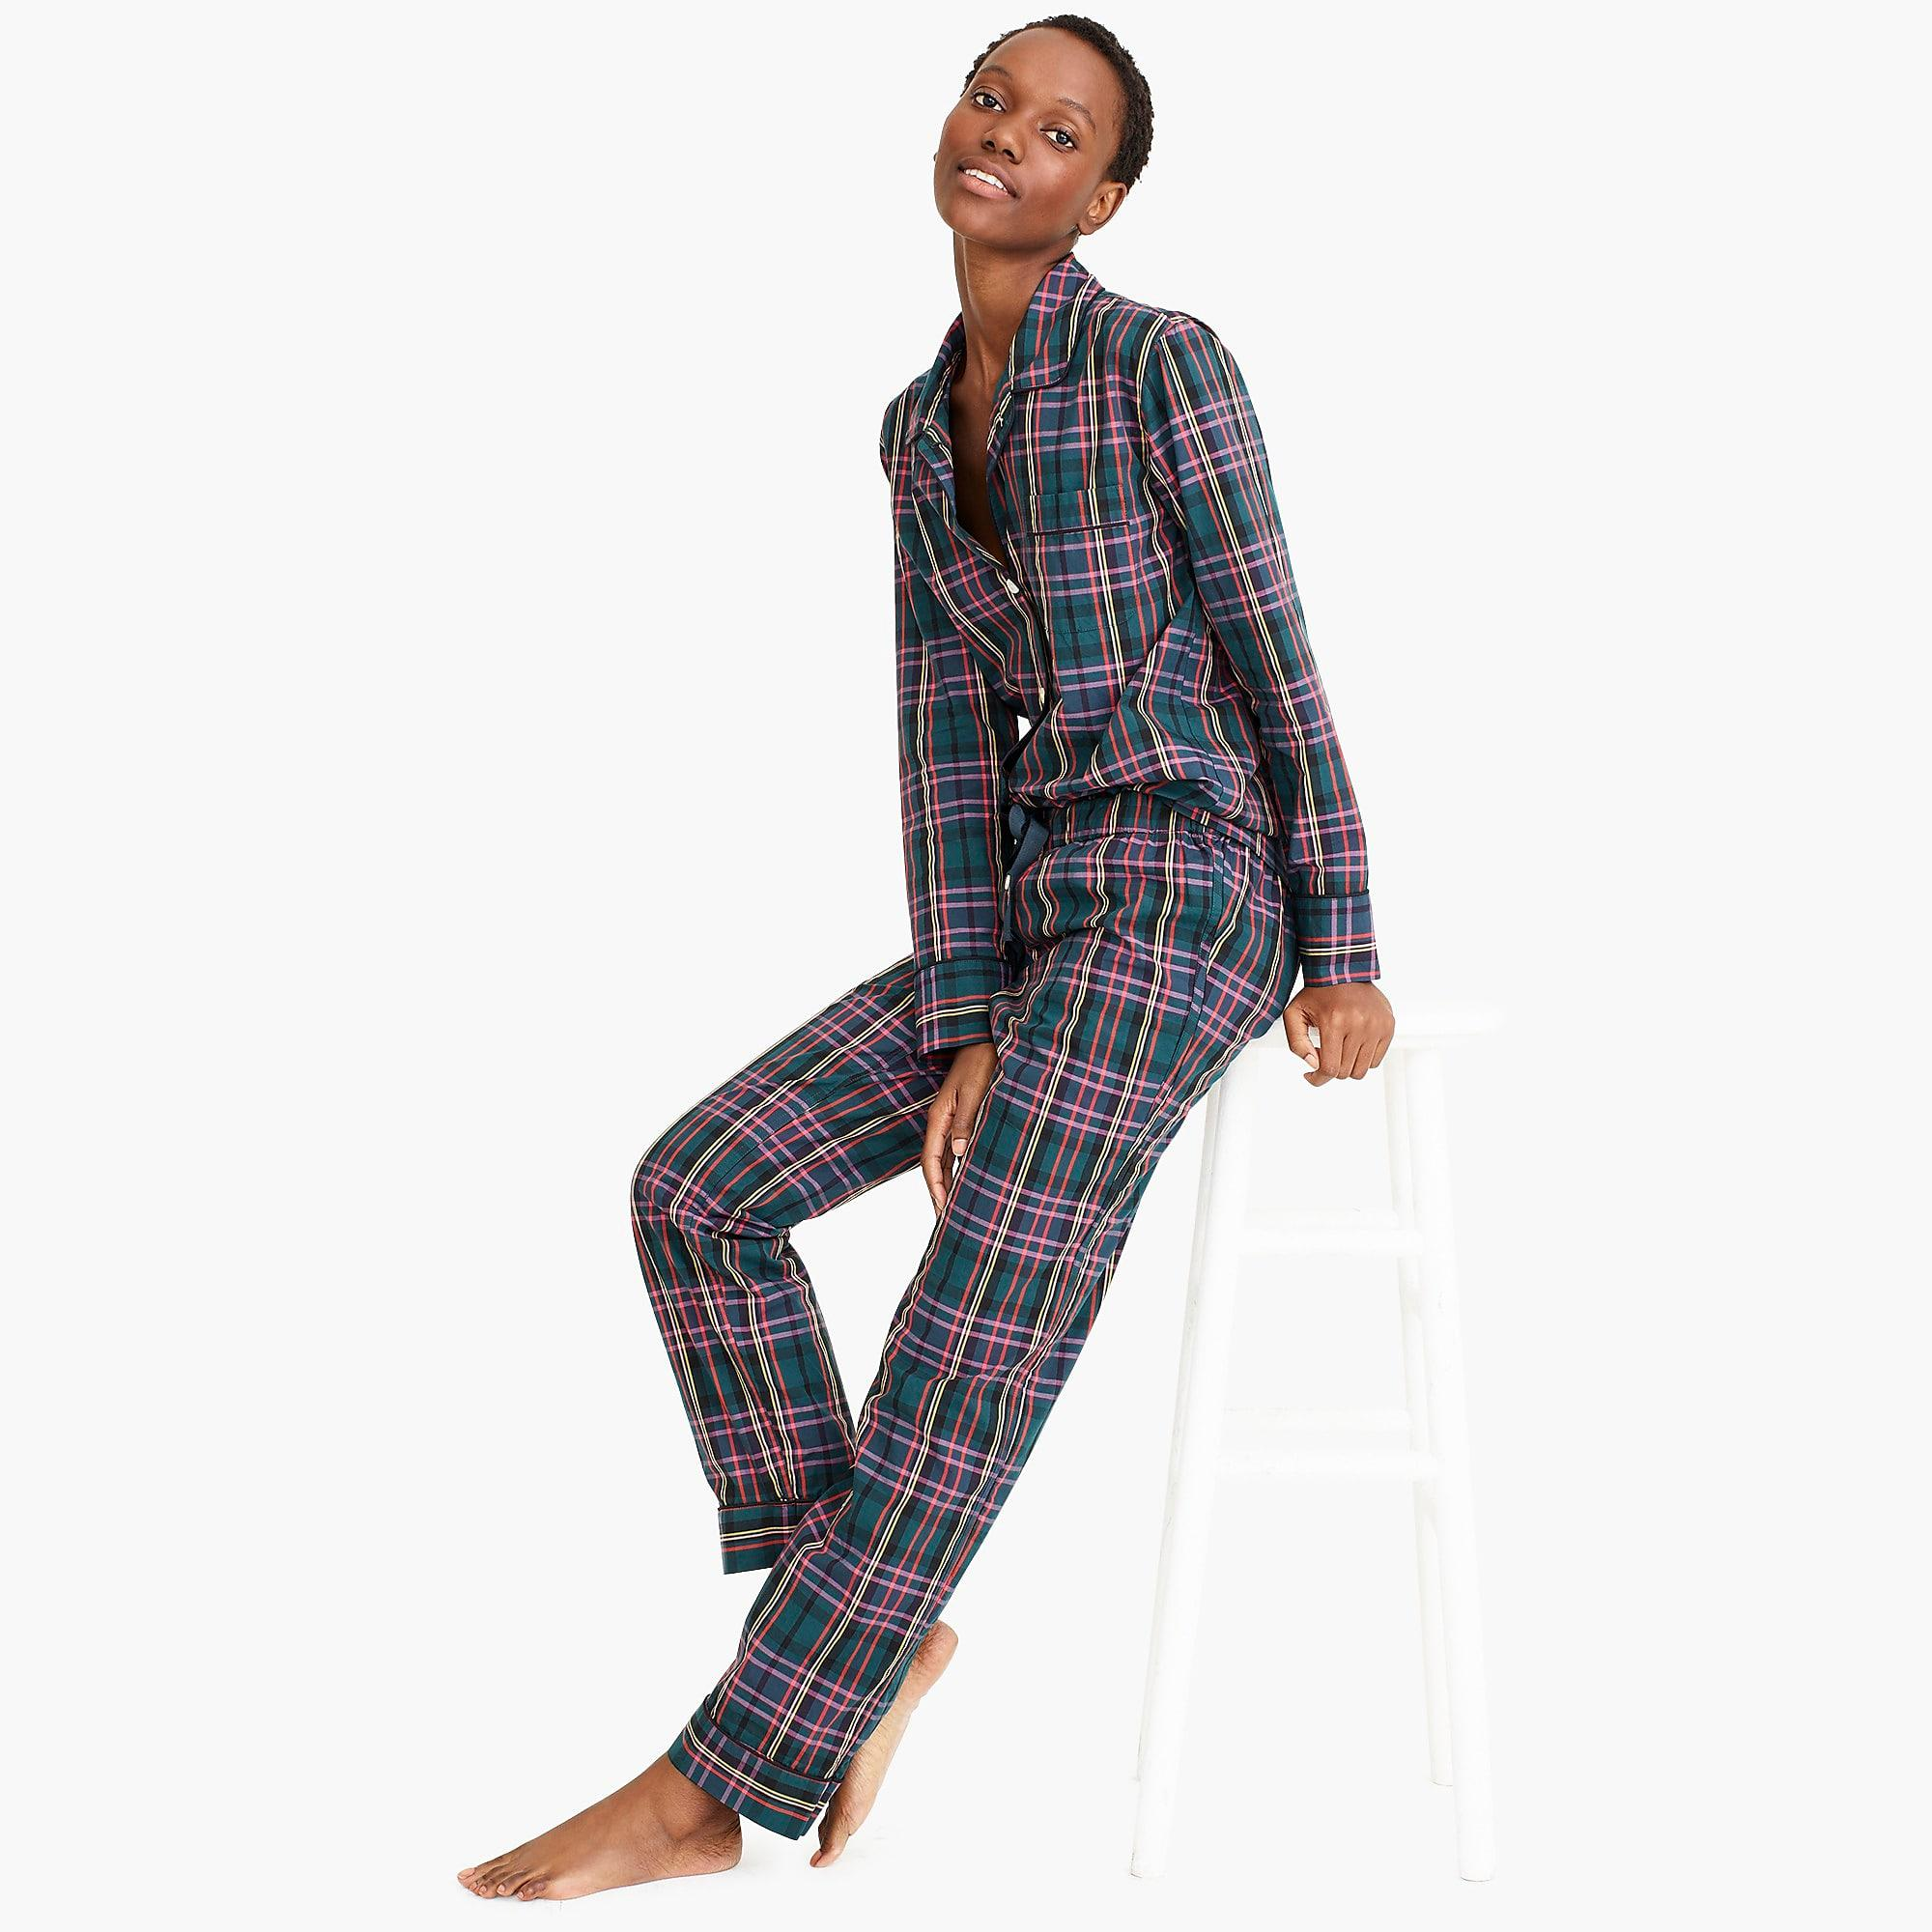 ed2ea16b4d J.Crew Vintage Pajama Set In Signature Tartan in Blue - Lyst